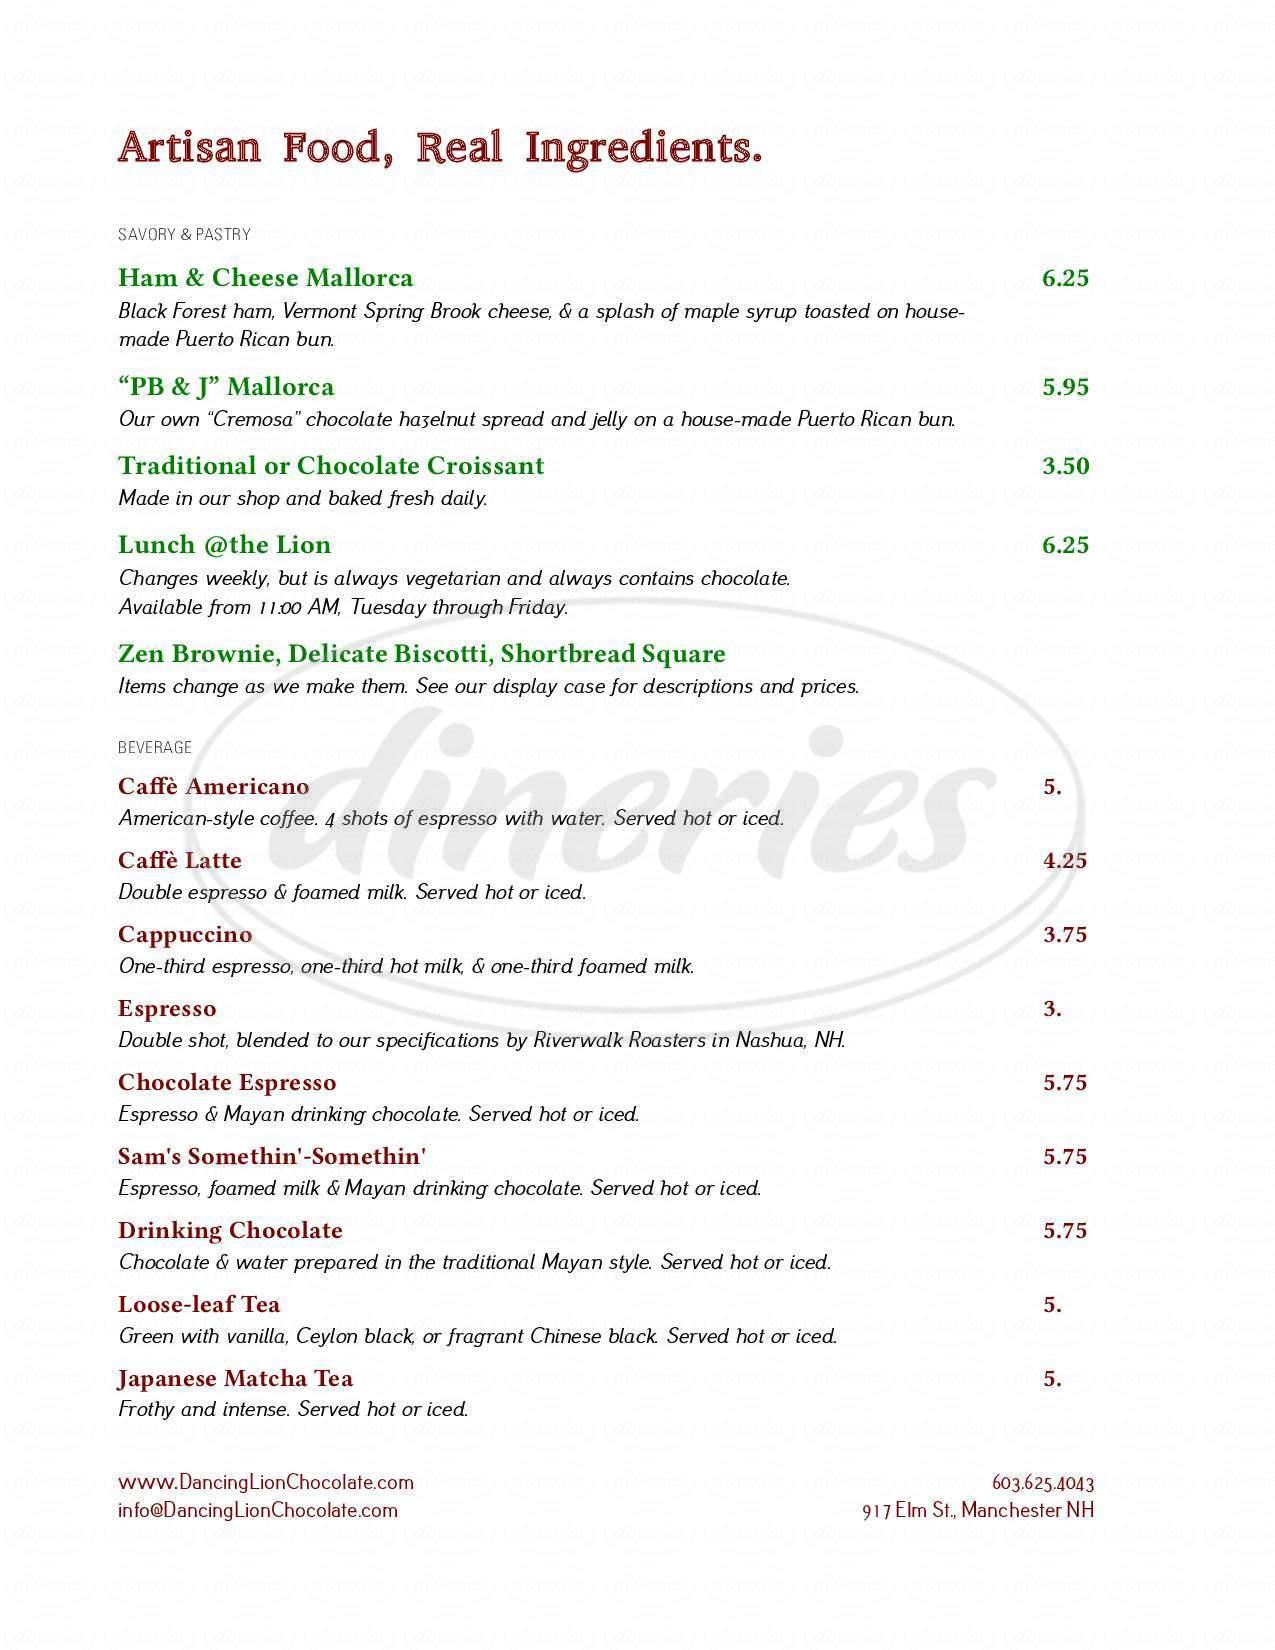 menu for Dancing Lion Chocolate